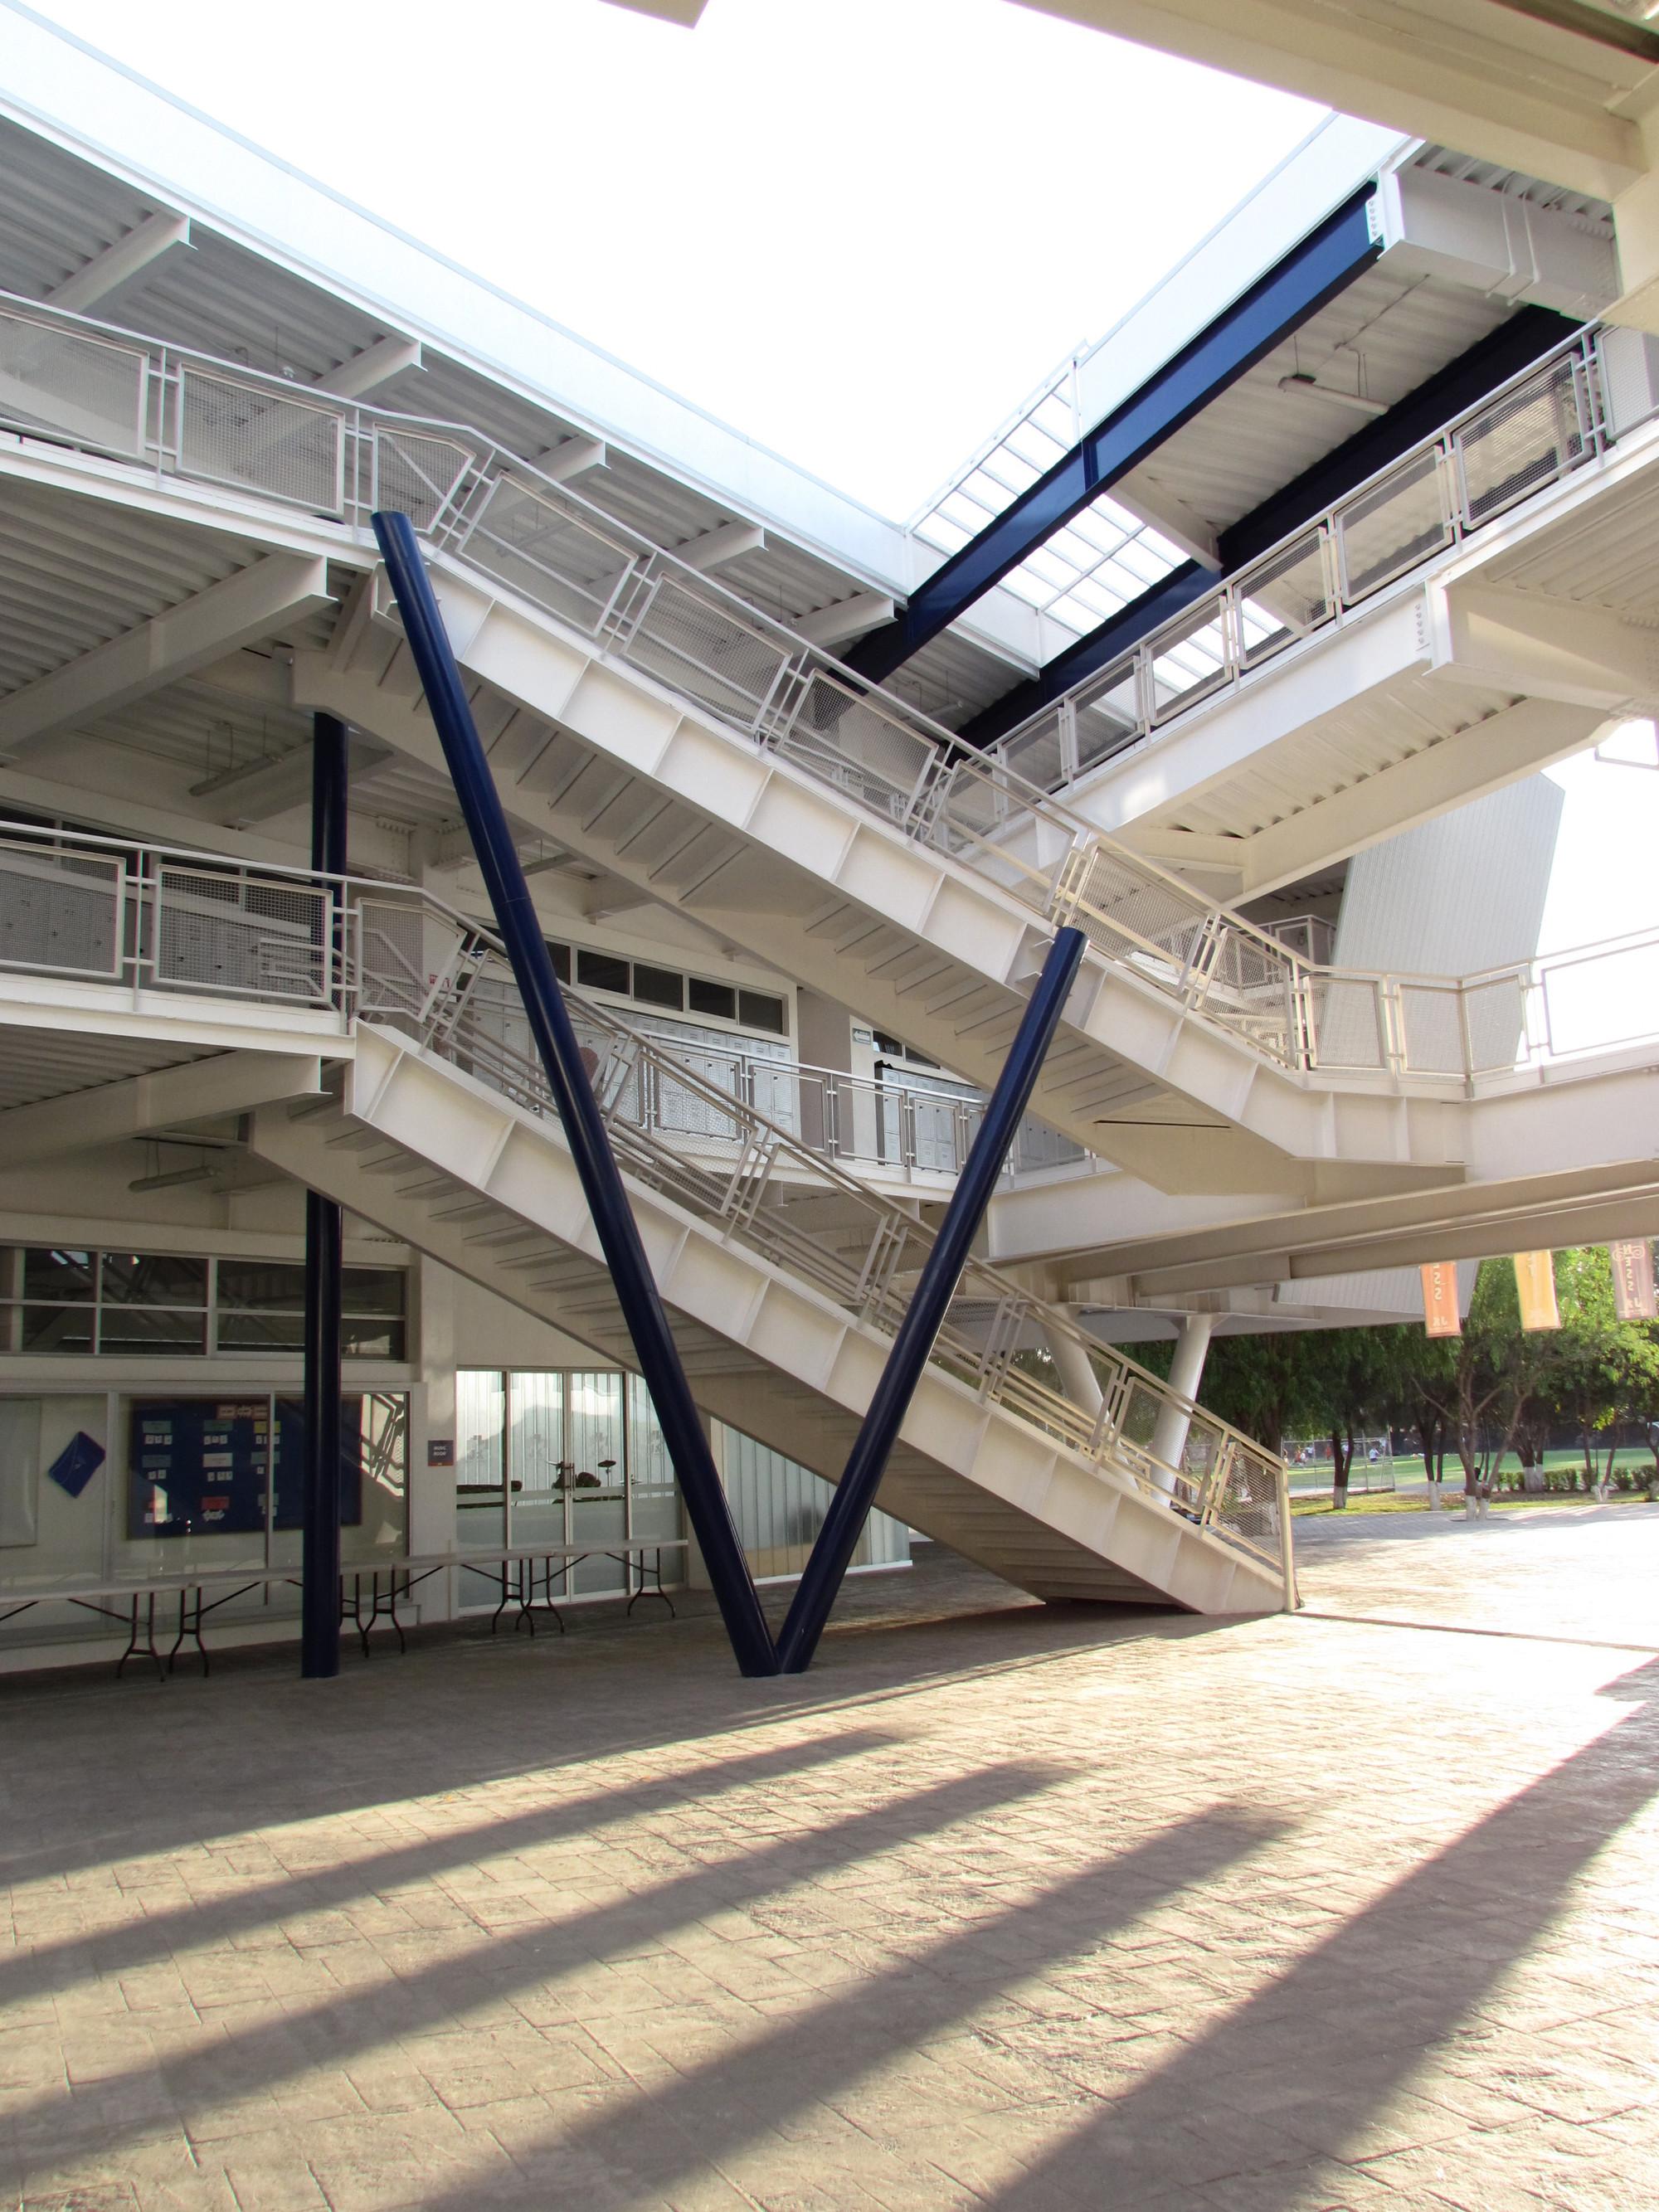 Jfk ms plataforma de arquitectura plataforma arquitectura for Plataforma arquitectura